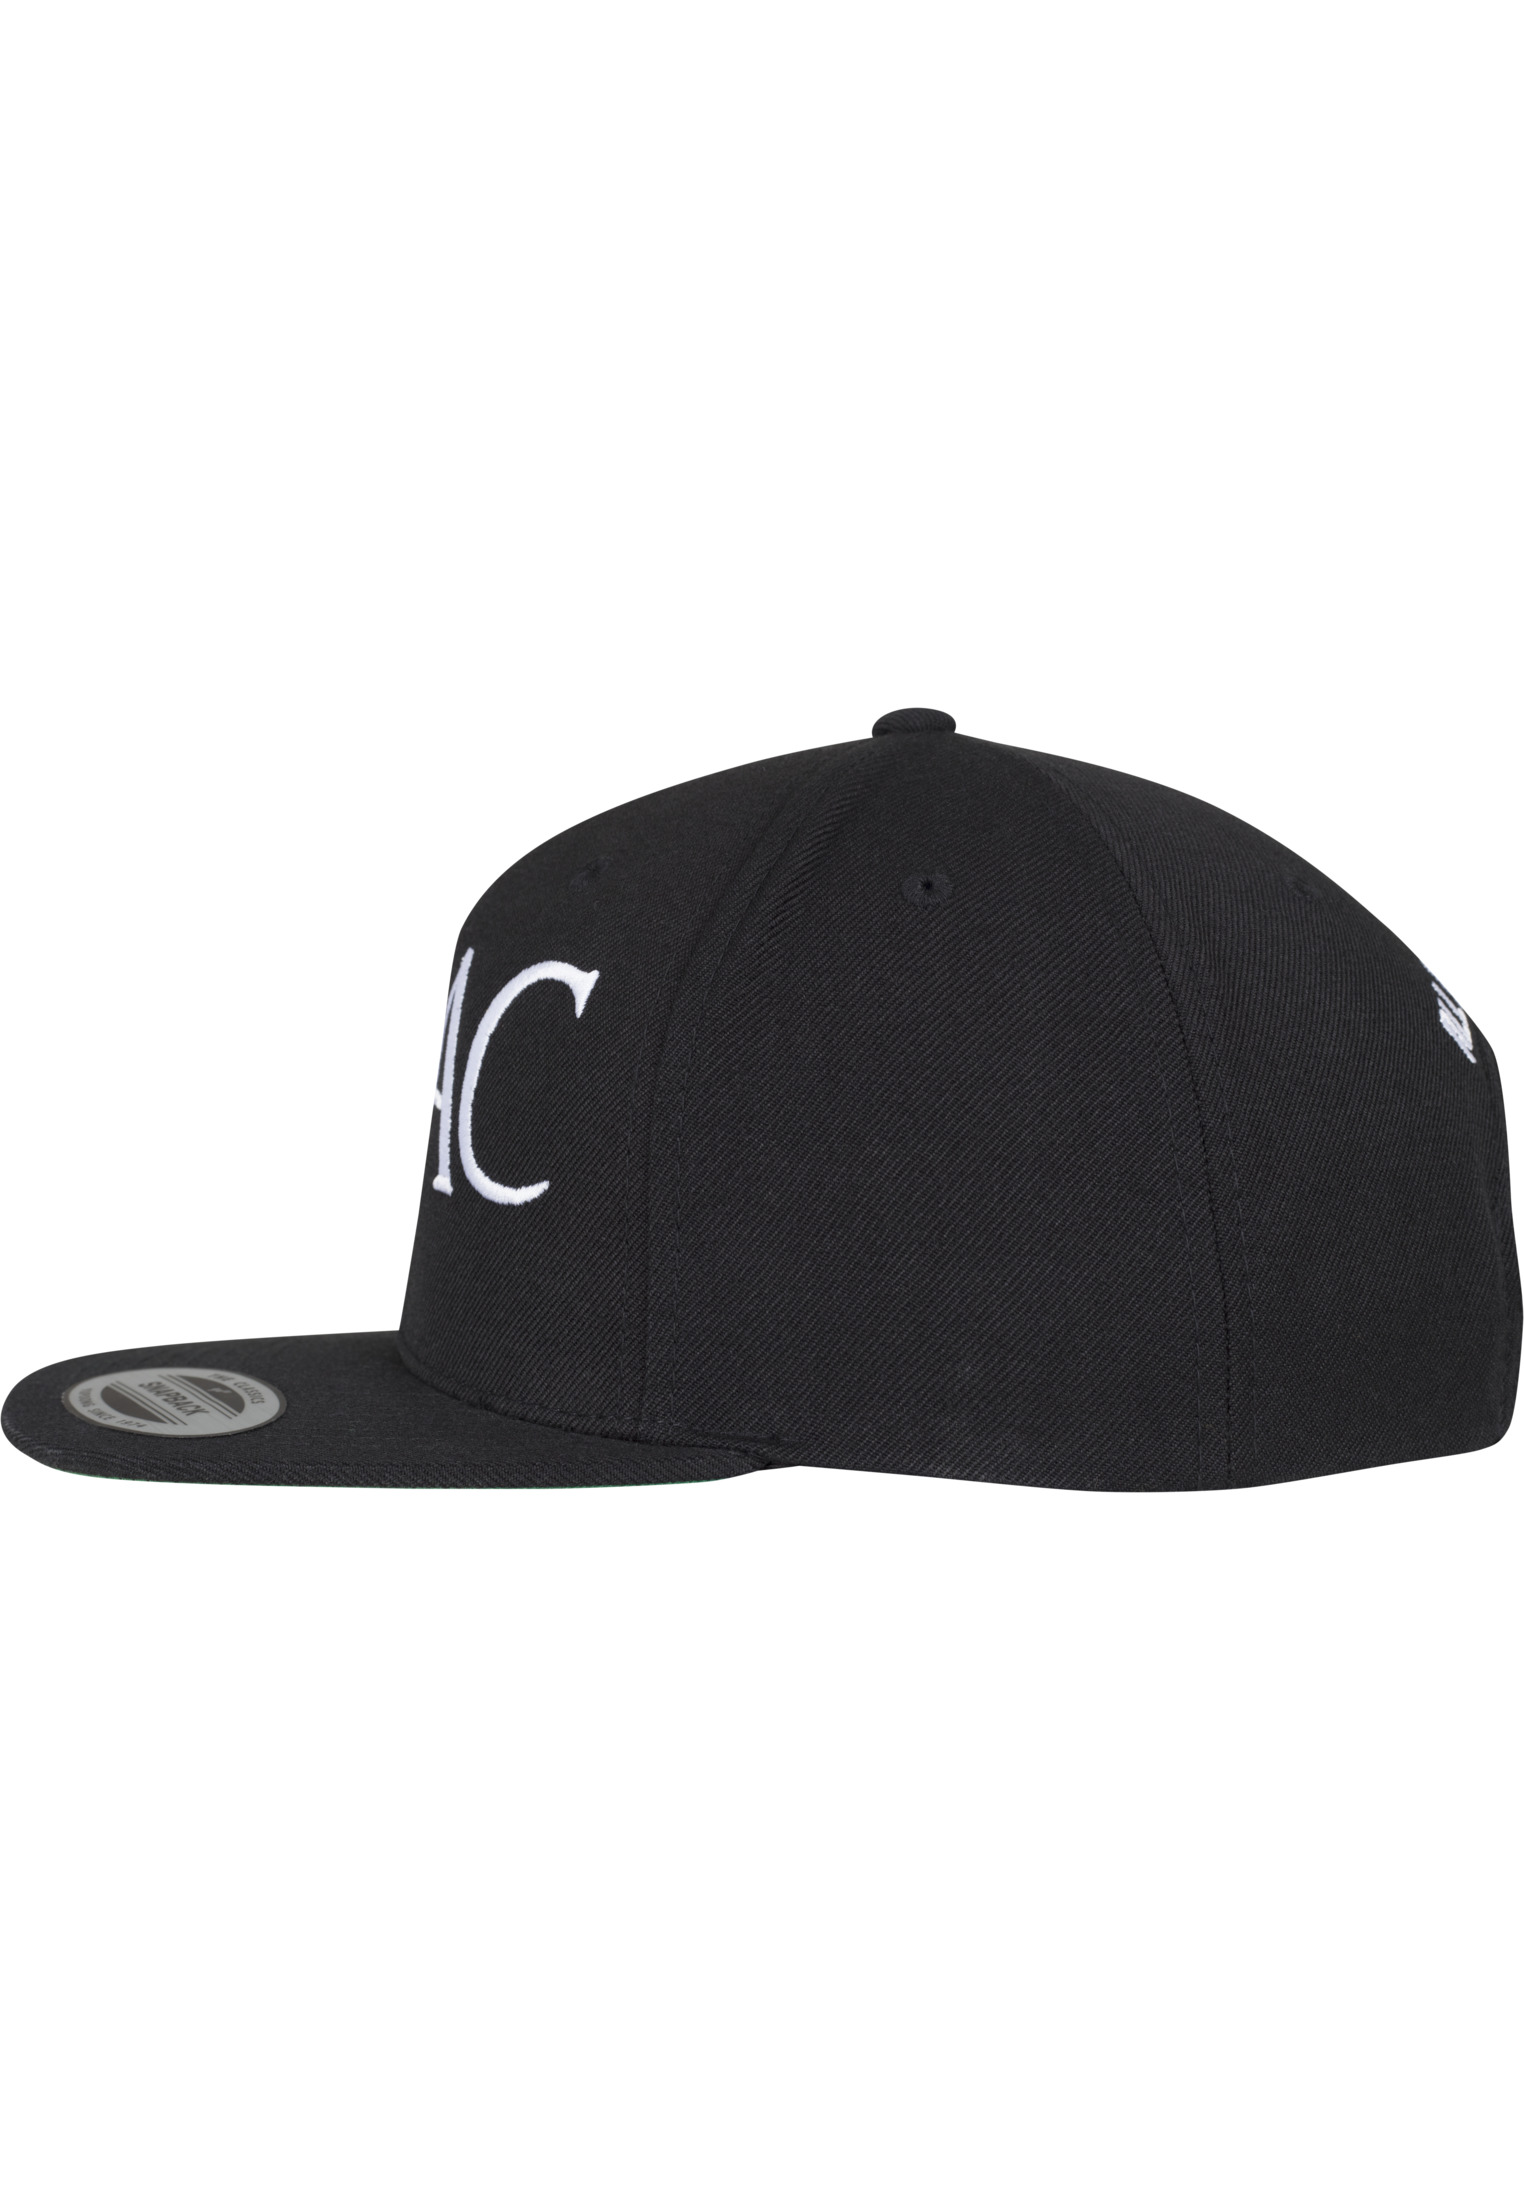 Baseball Cap Verstellbar Unisex heekpek Unisex Baseball Cap in 4 Farben f/ür Erwachsene und Kinder Snapback Kappe Oberfl/äche